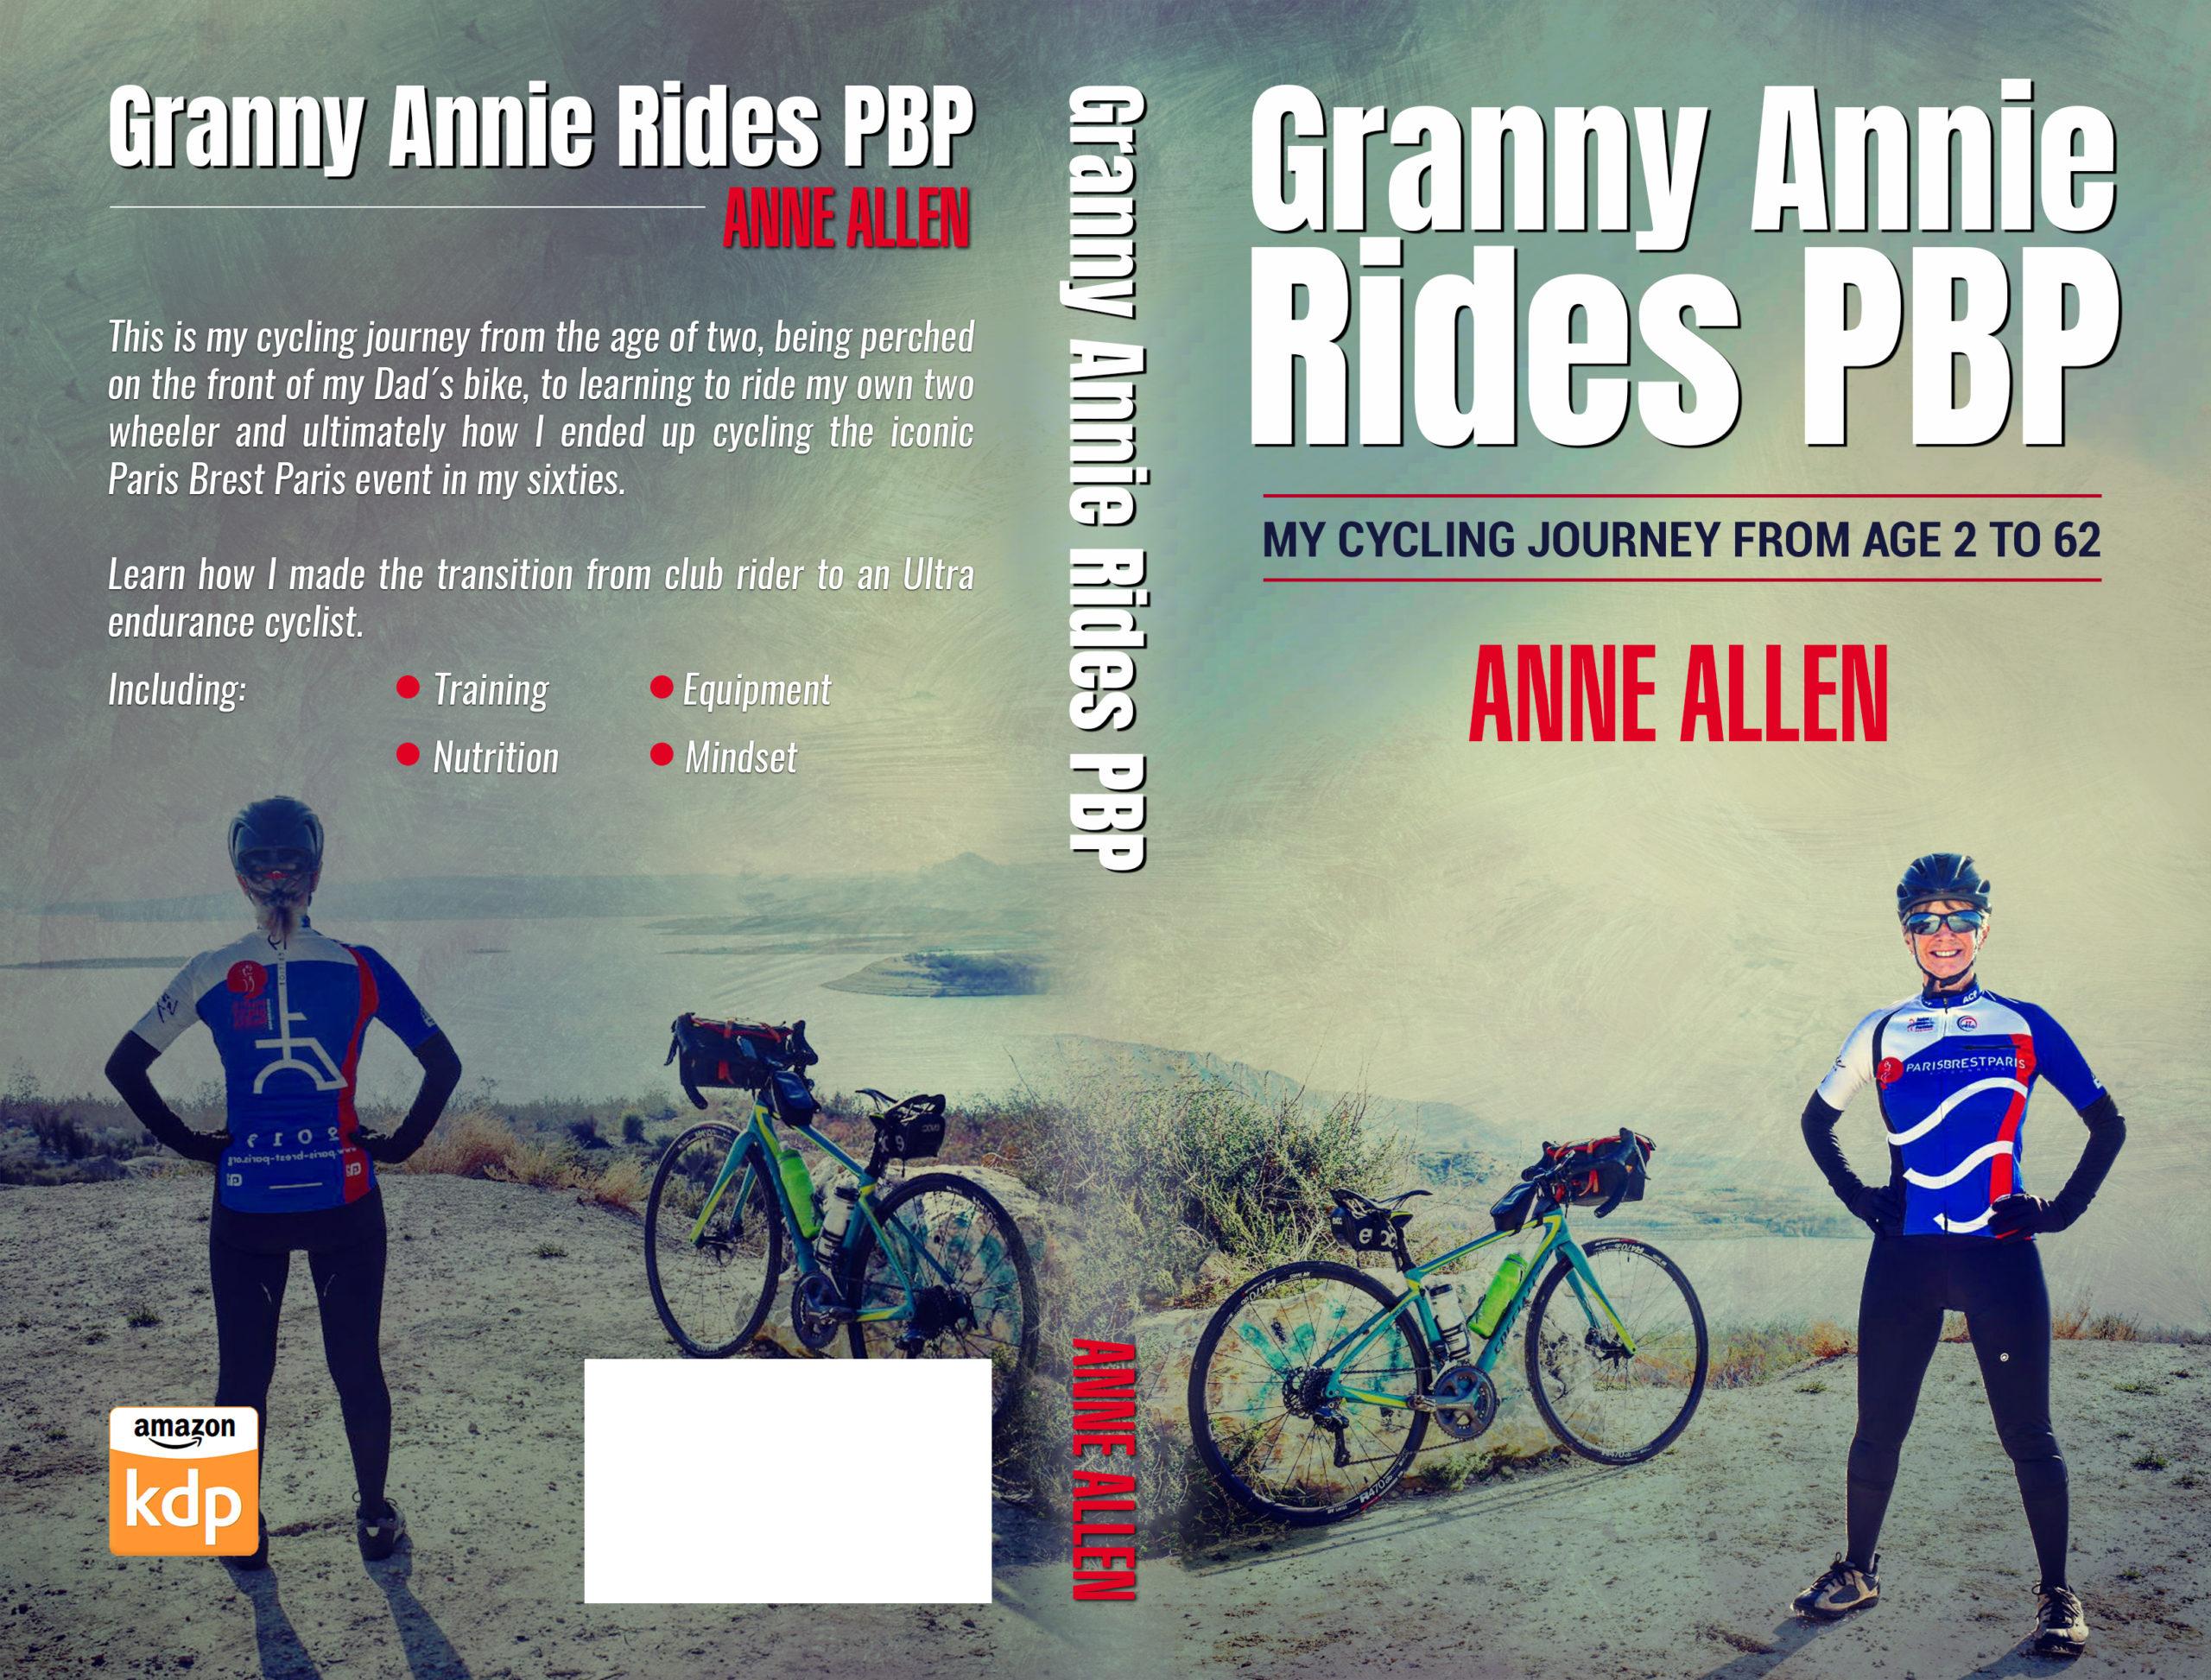 Granny Annie rides PBP